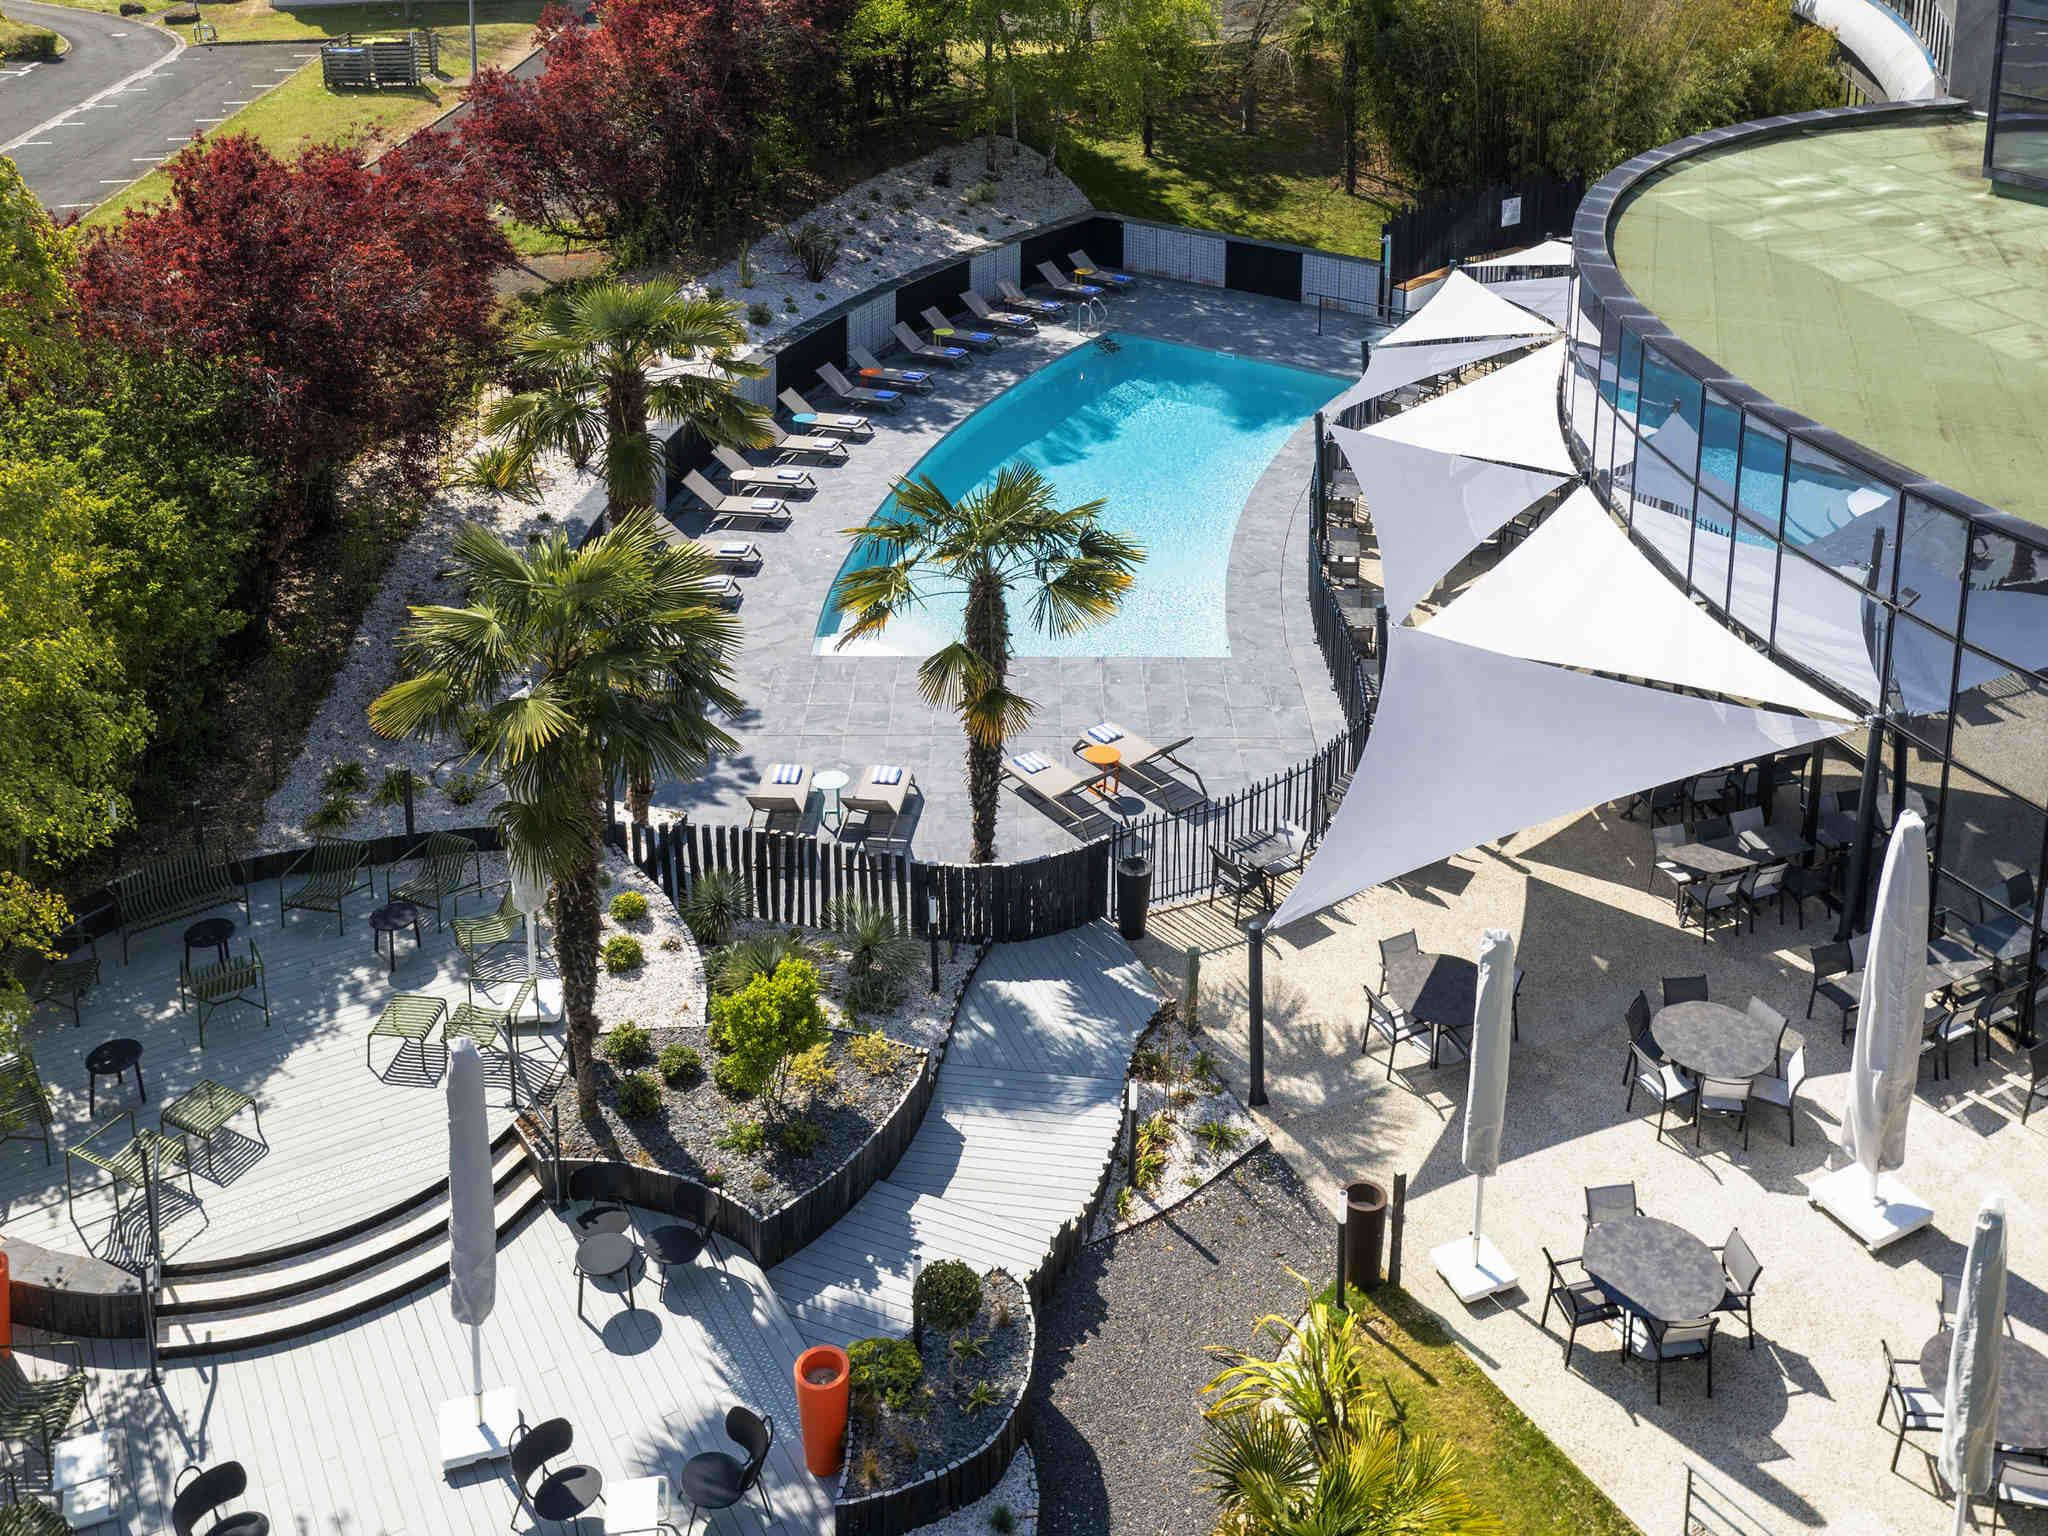 Hotel - Novotel Poitiers Site du Futuroscope